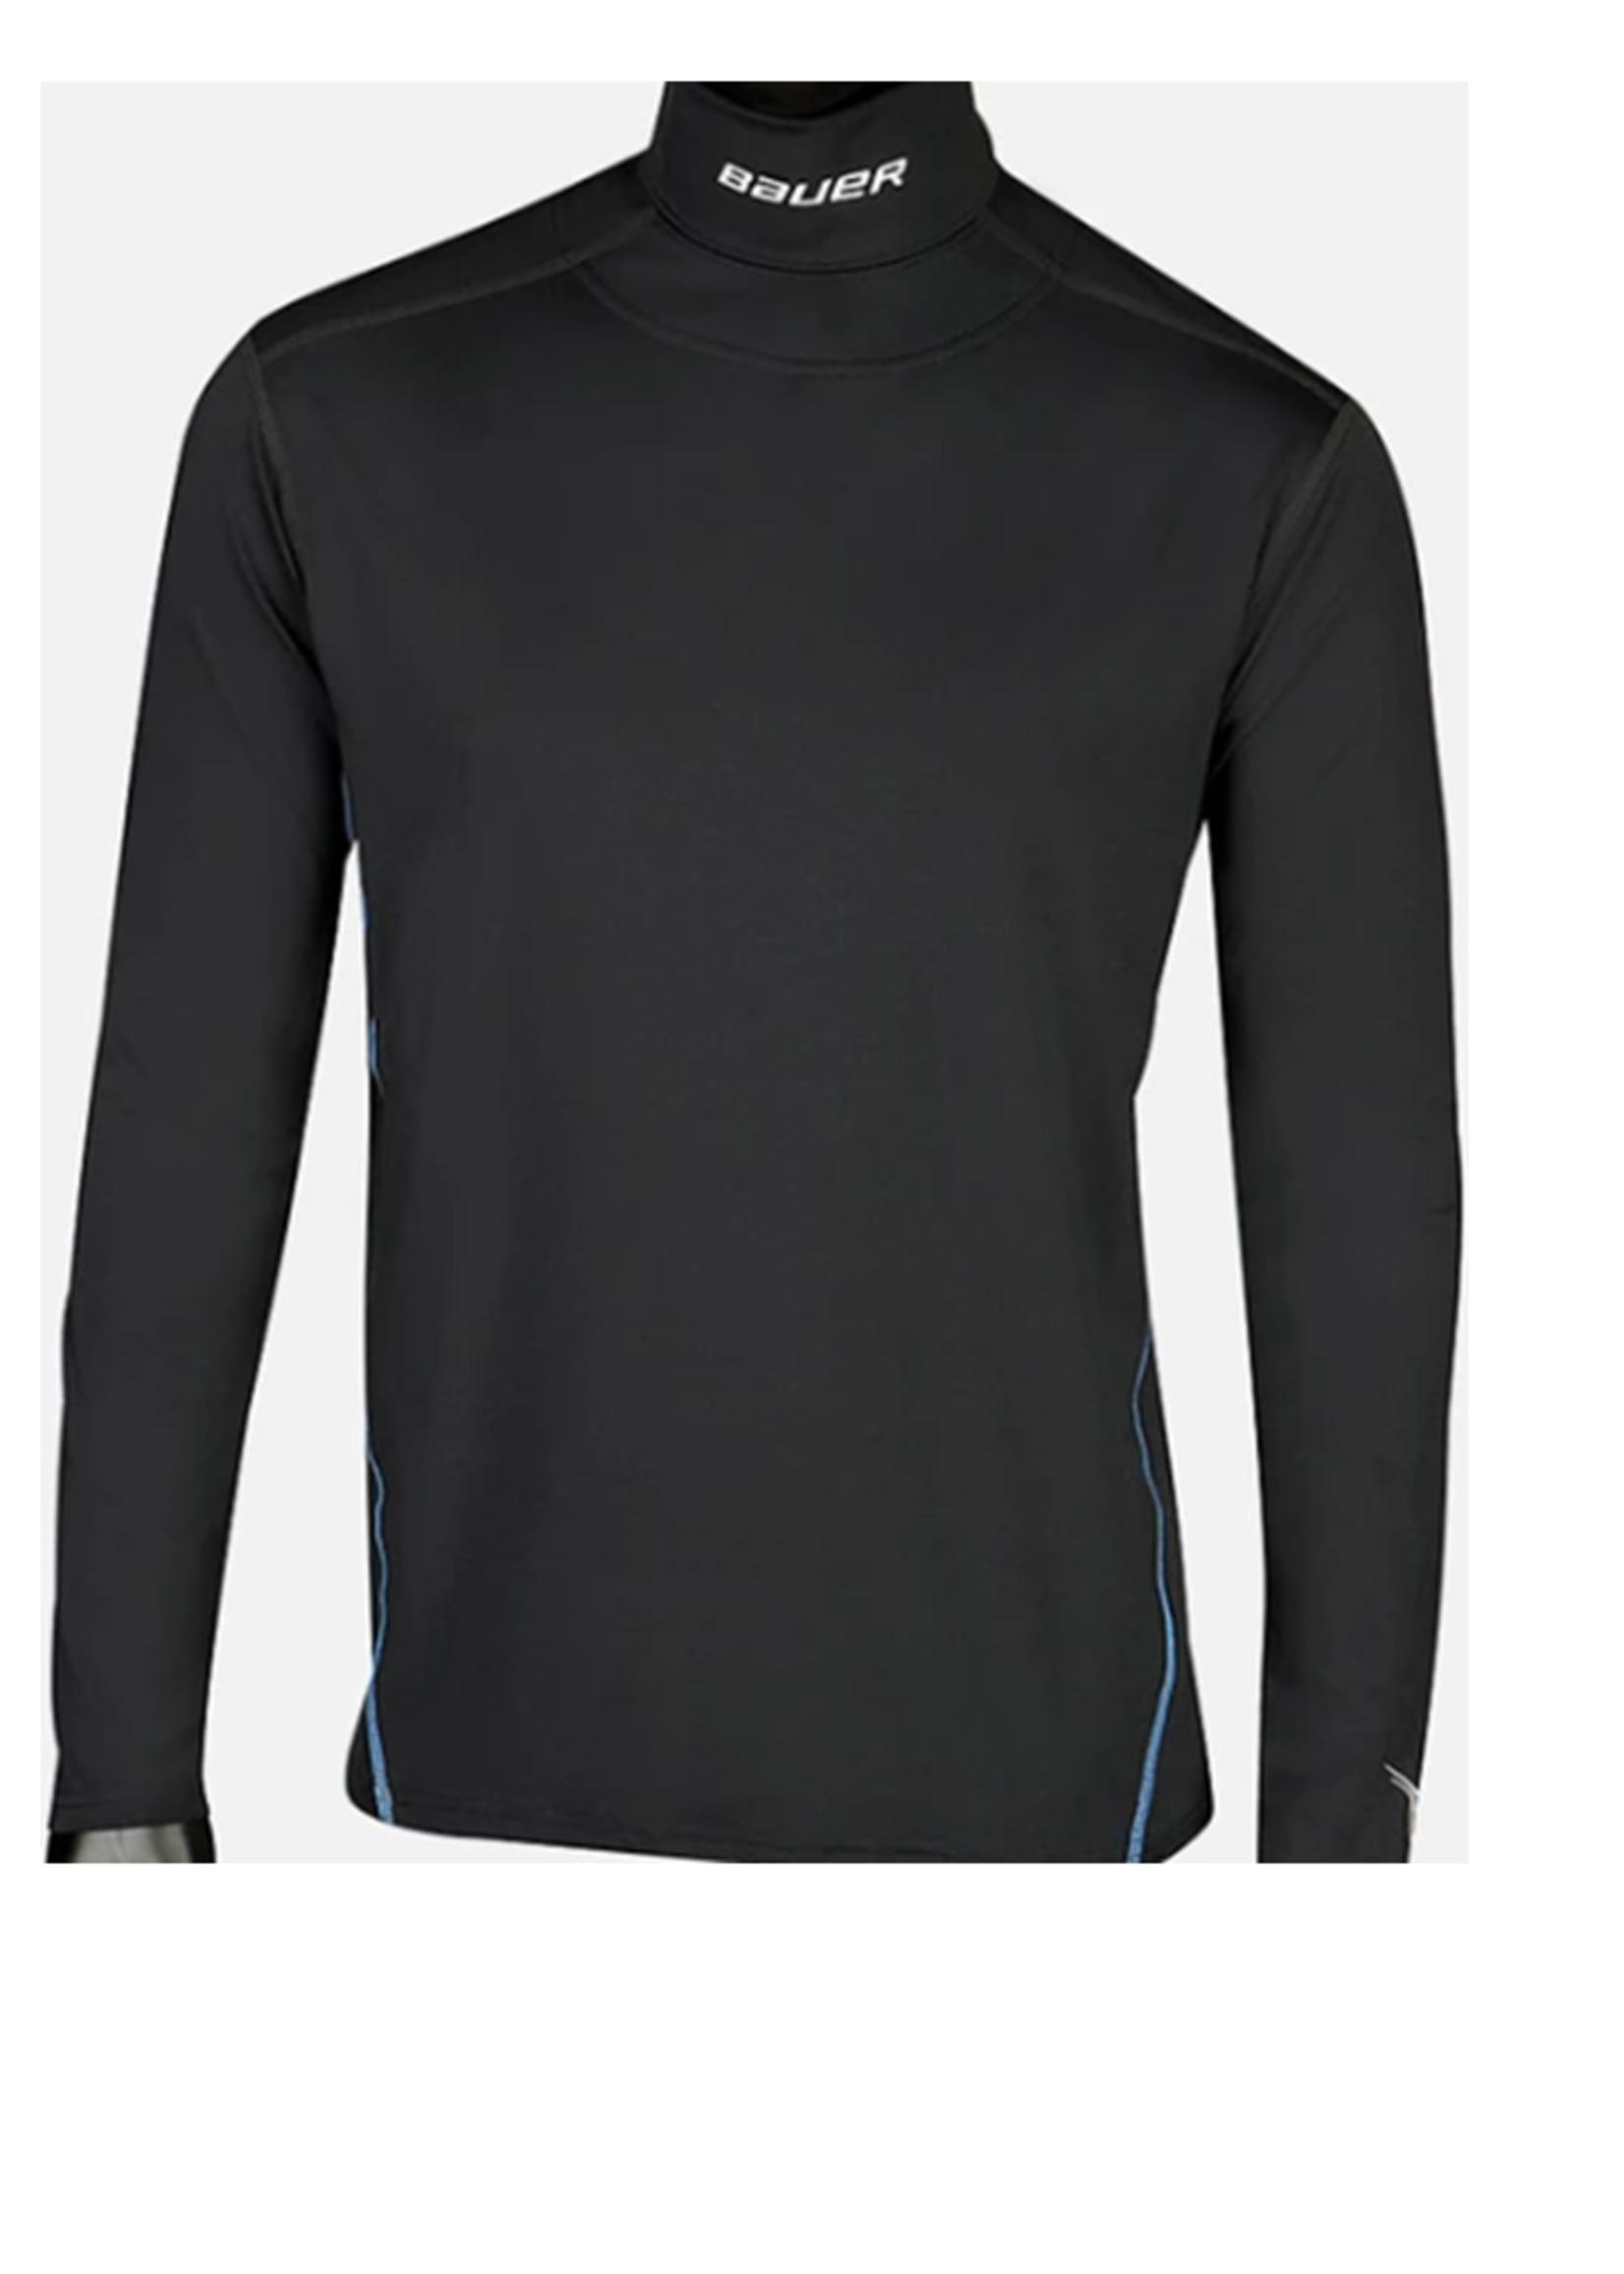 Bauer Senior Long Sleeve Neckprotect Shirt